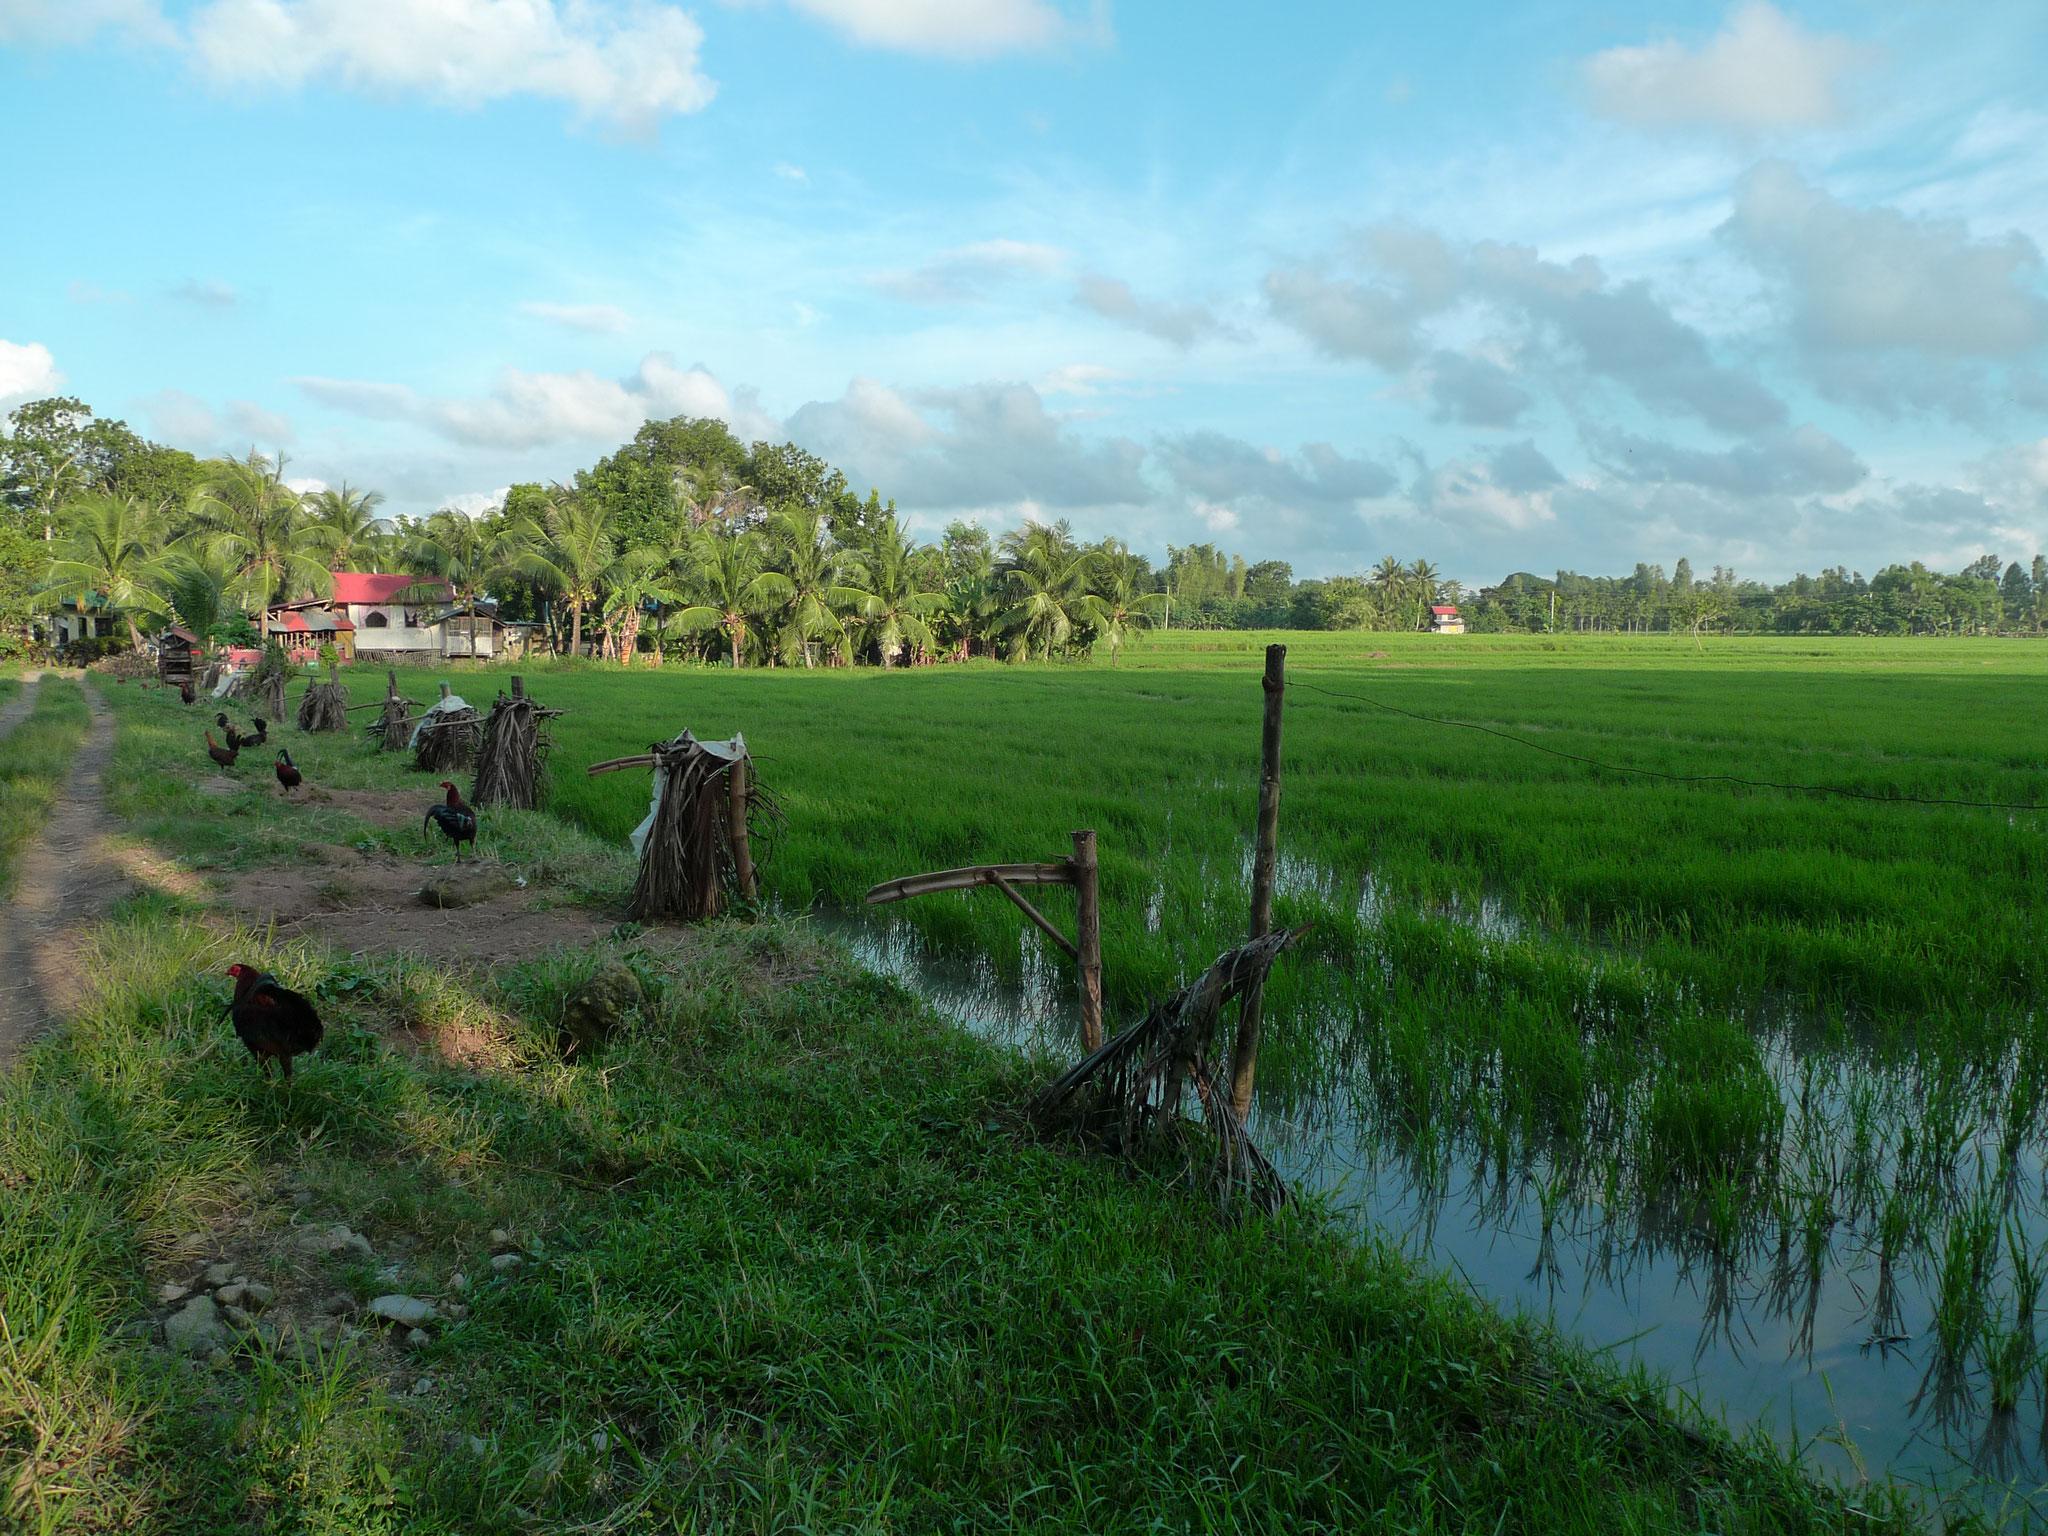 Die Reisfelder vor dem RT